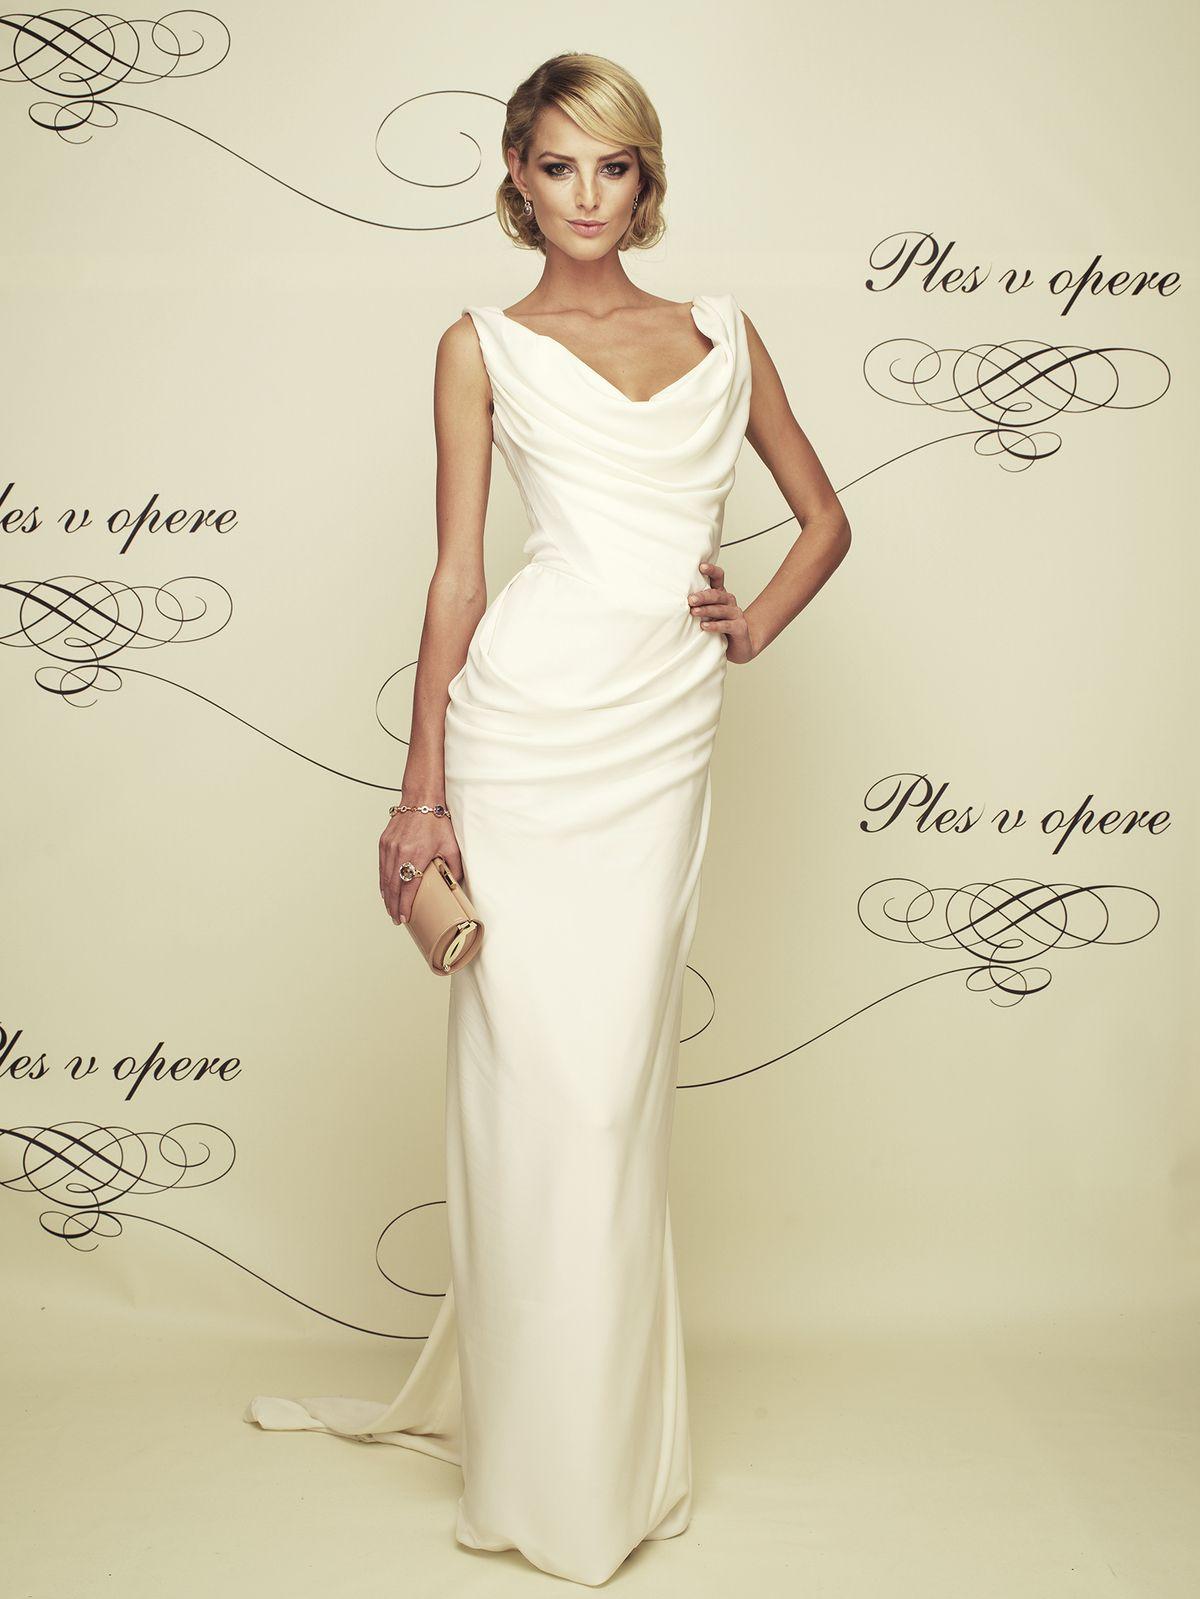 Simple Elegance Slovak Model Michaela Kocianova In Vivienne